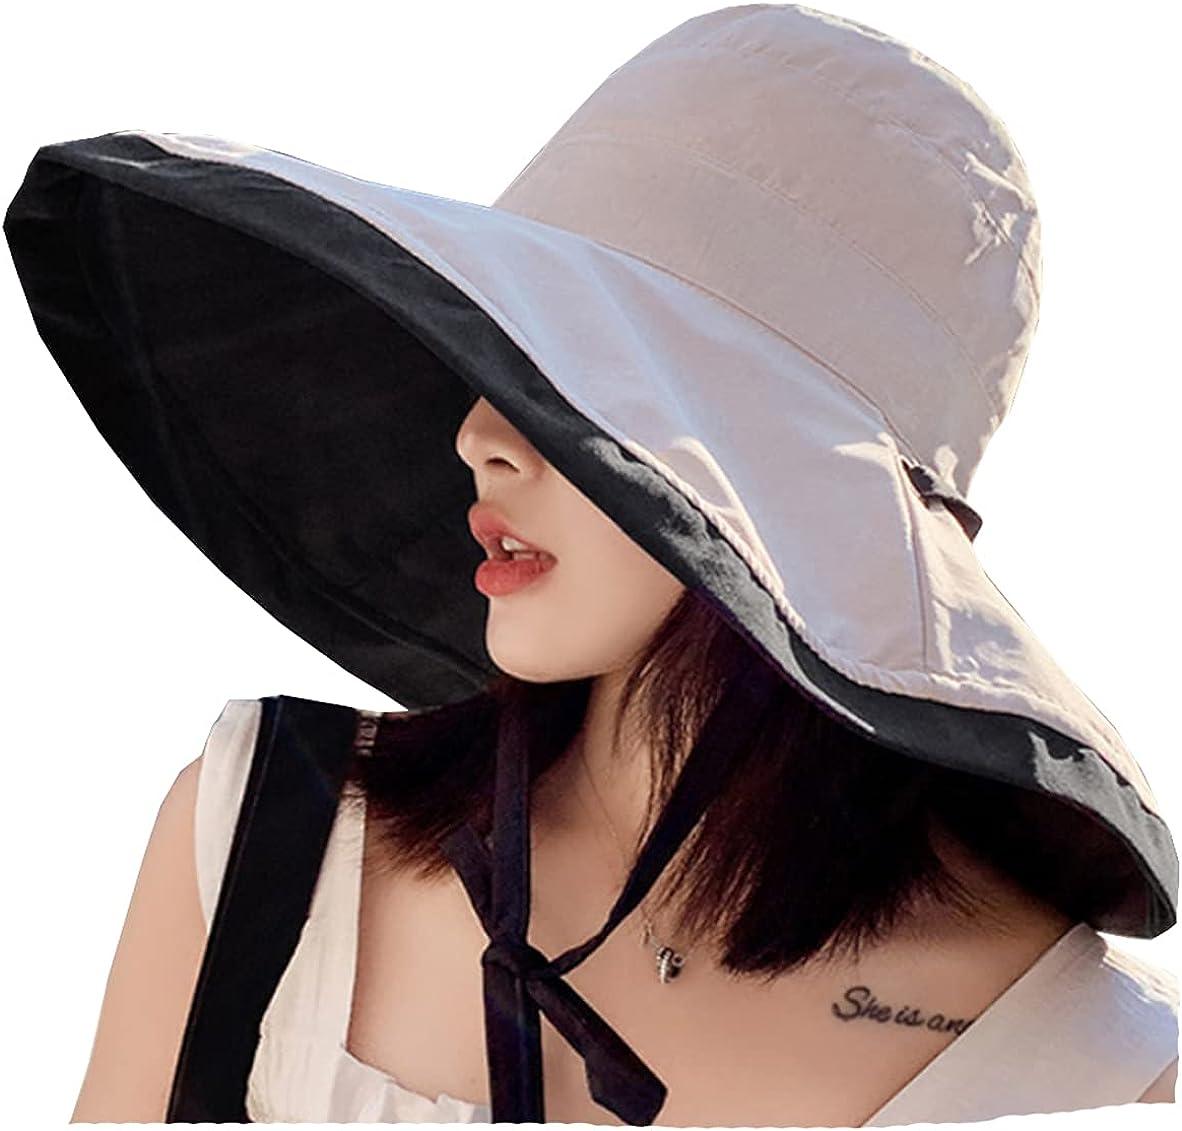 2 in 1 Womens Sun Hat Wide Brim Summer Hat Foldable Roll up Floppy Beach Hats for Women